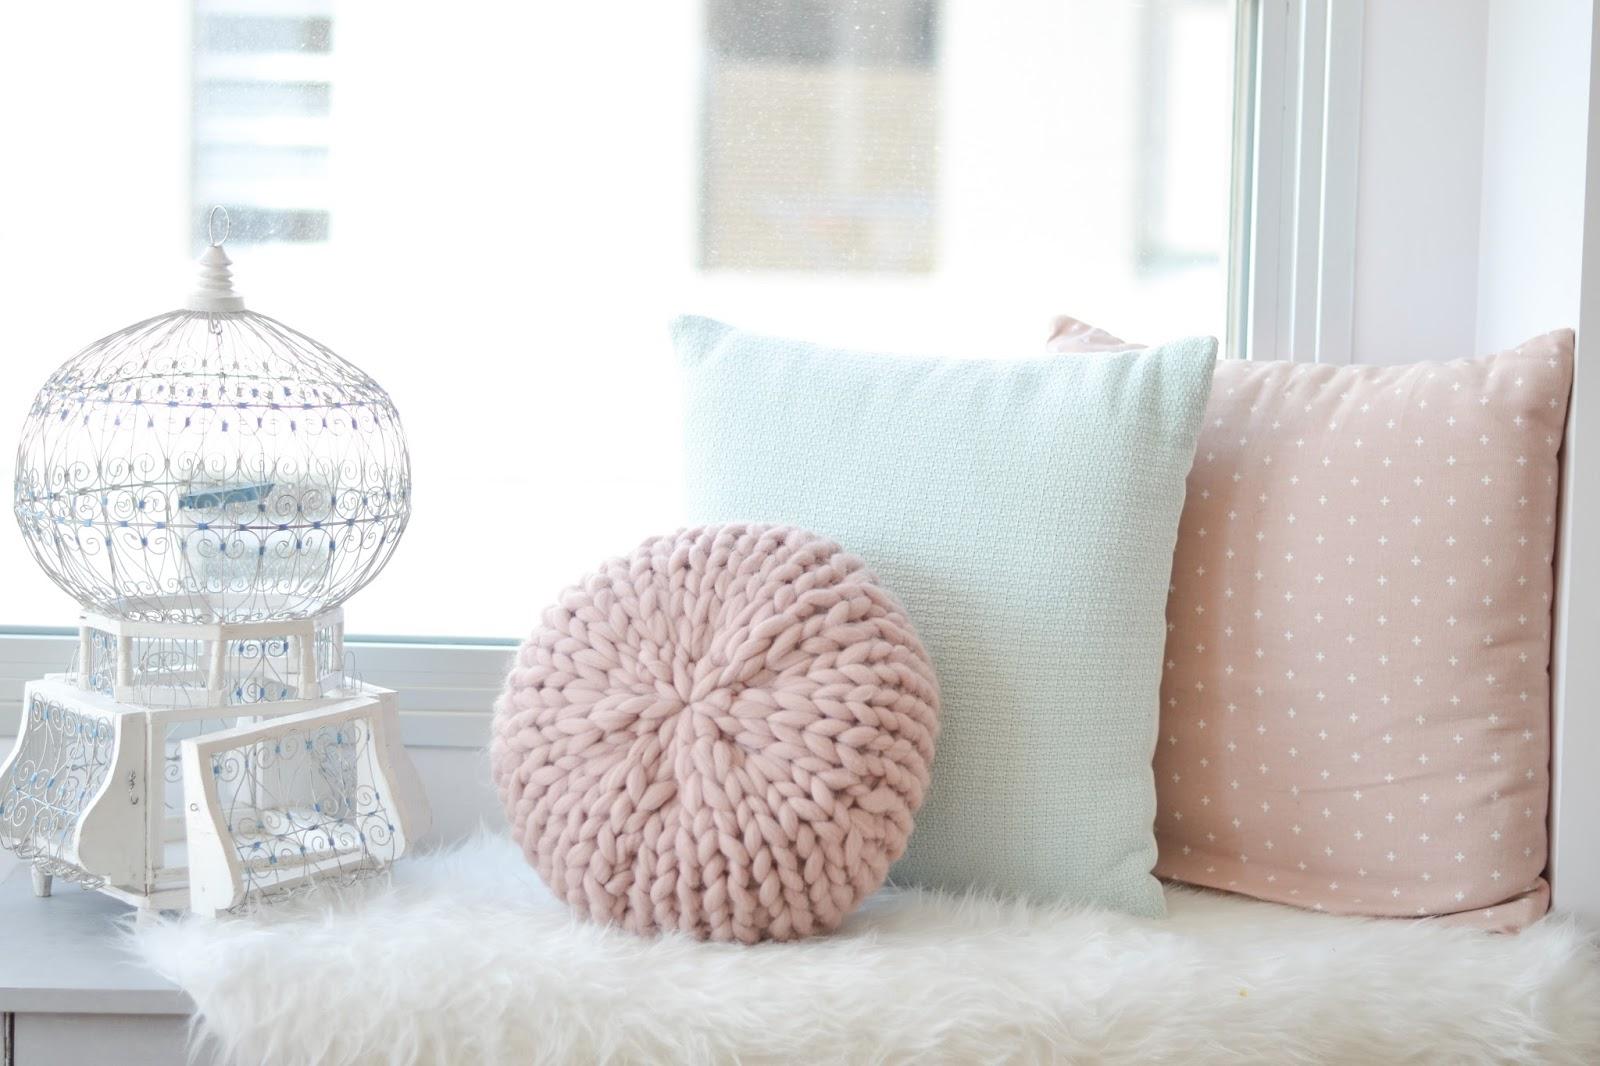 knitted xxl round pillow / Cojín redondo de punto xxl - Sofia Parapluie